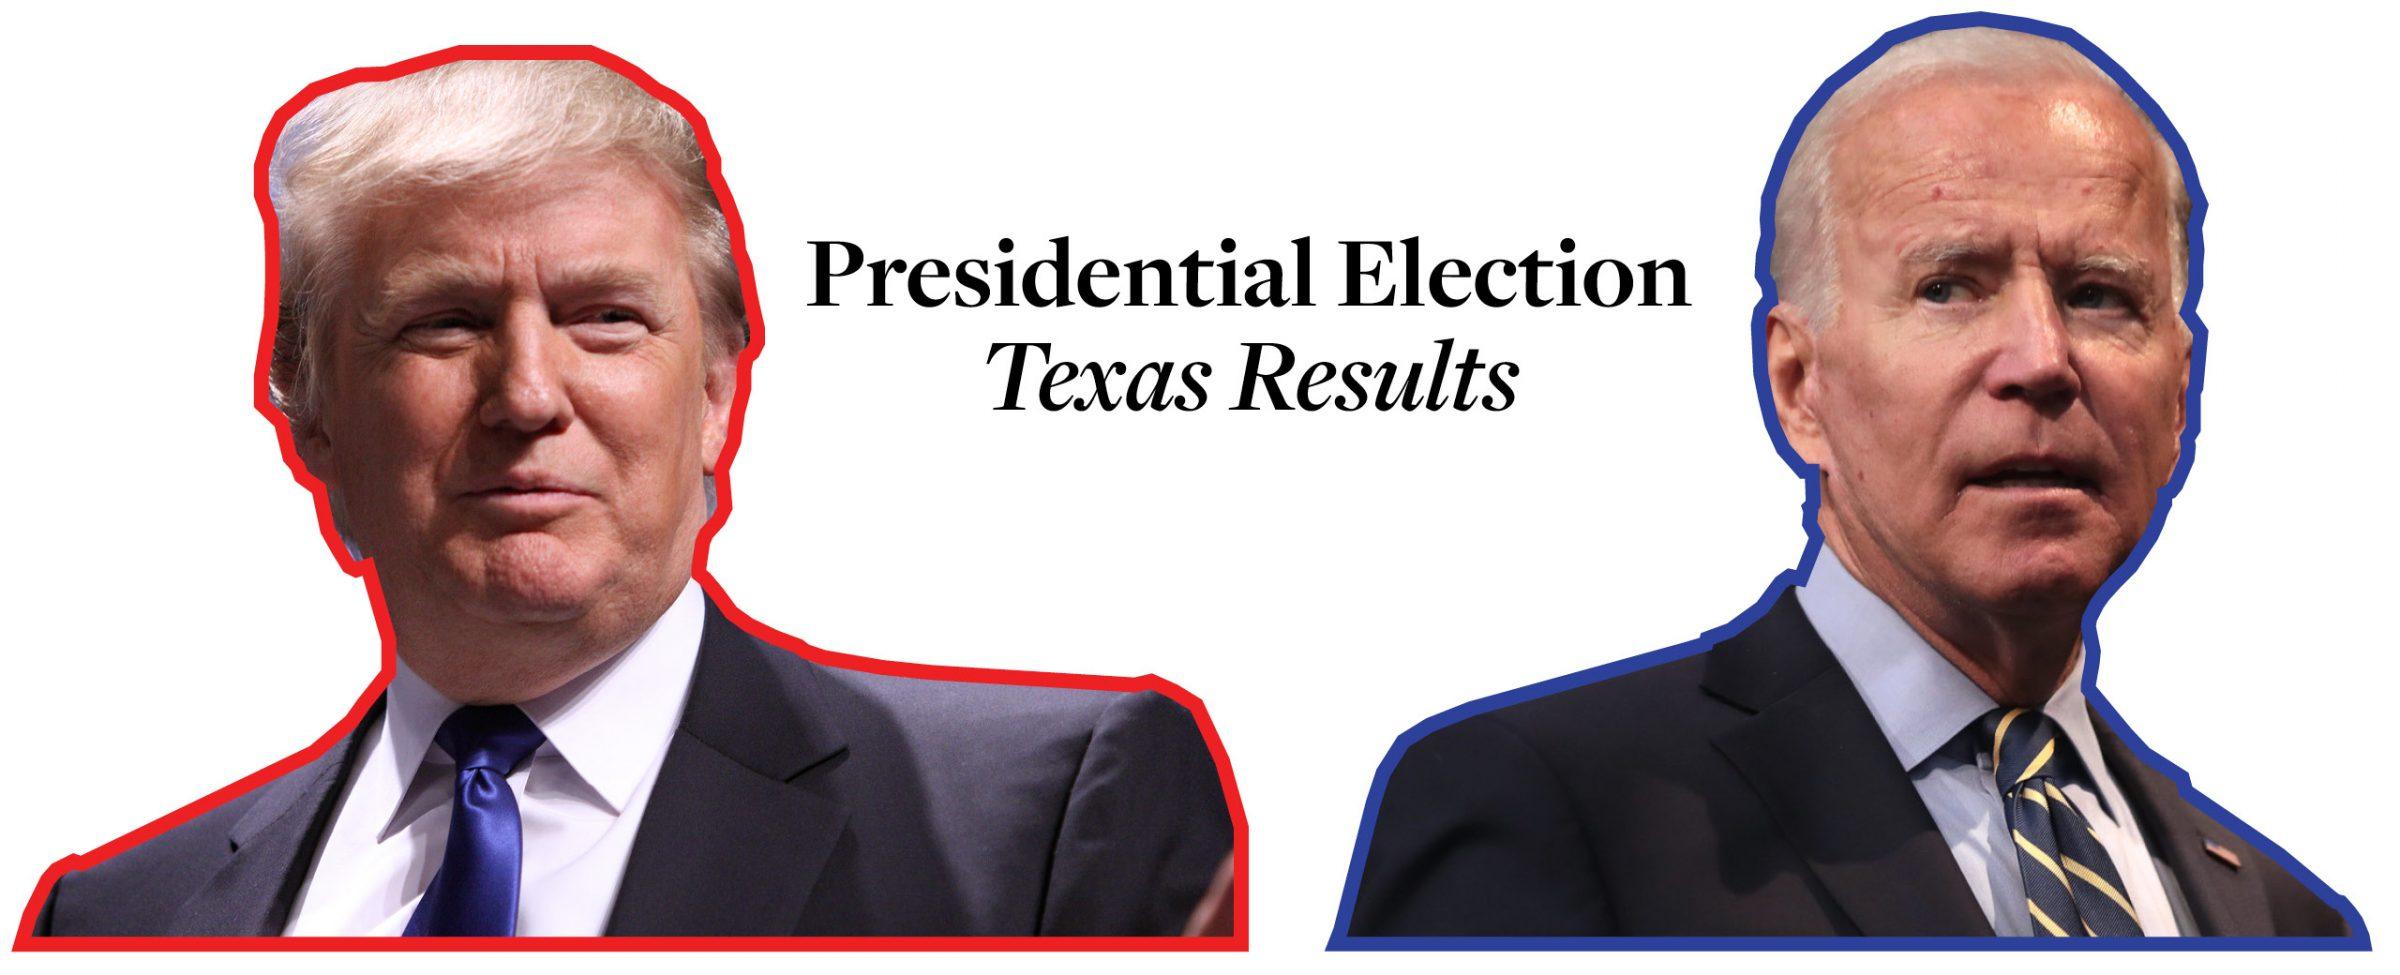 https://thetexan.news/wp-content/uploads/2020/10/biden-trump-head-cover-scaled.jpg